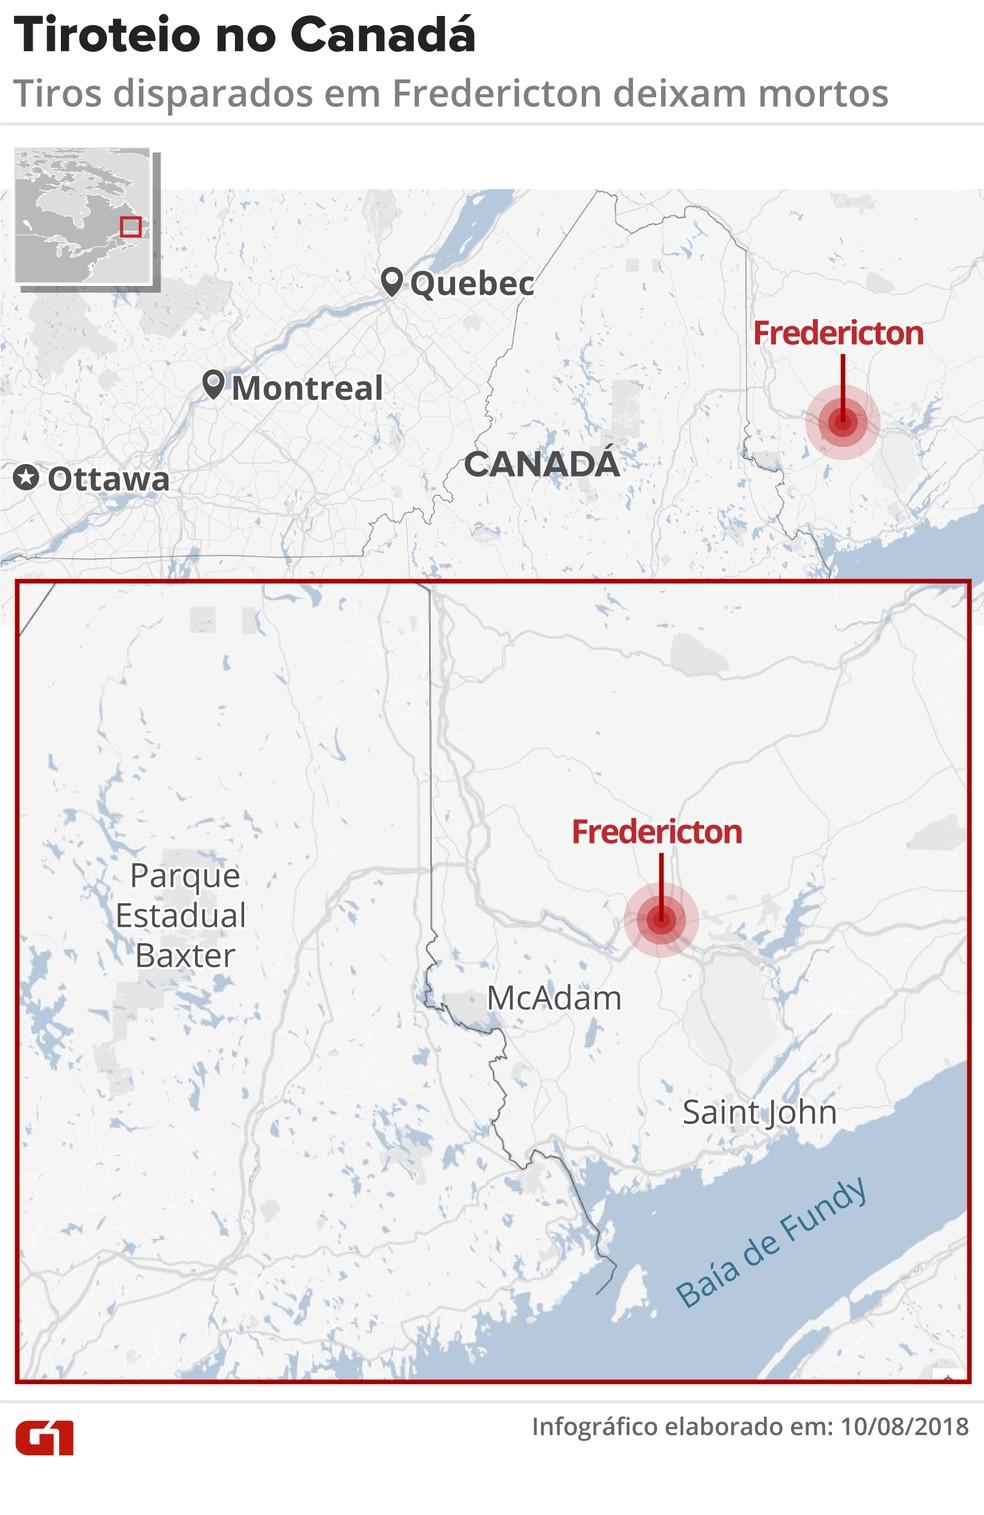 Tiroteio deixa mortos em Fredericton, no Canadá (Foto: Juliane Monteiro/G1)